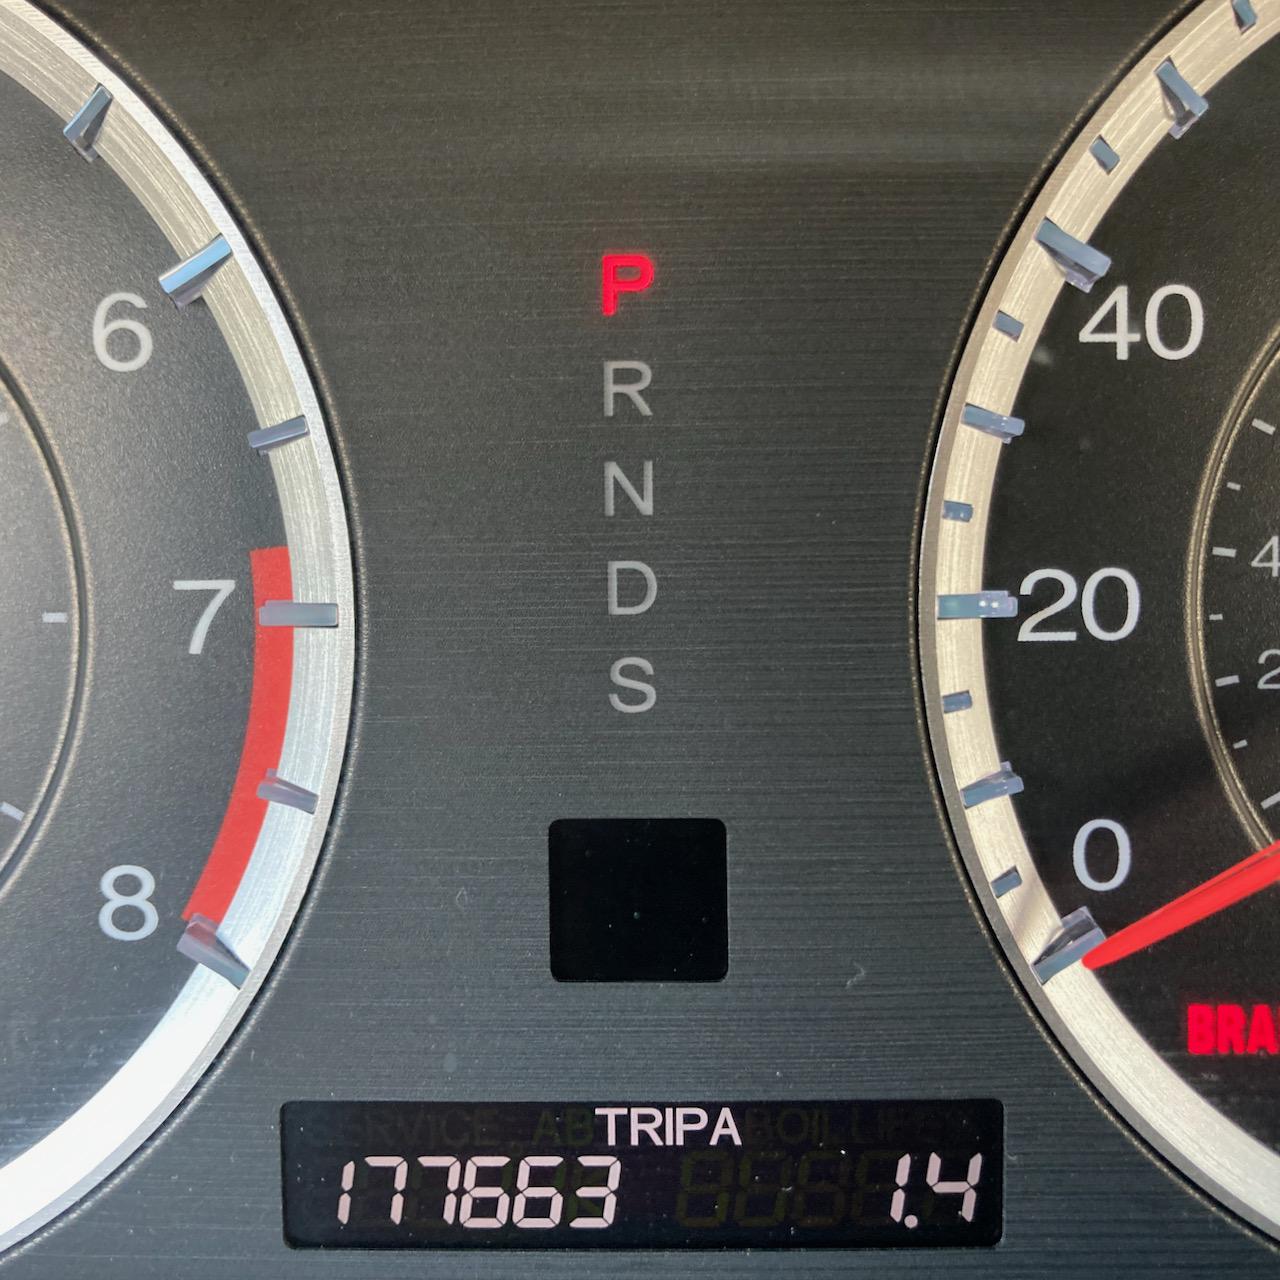 Car odometer reading 177663 TRIP A 1.4